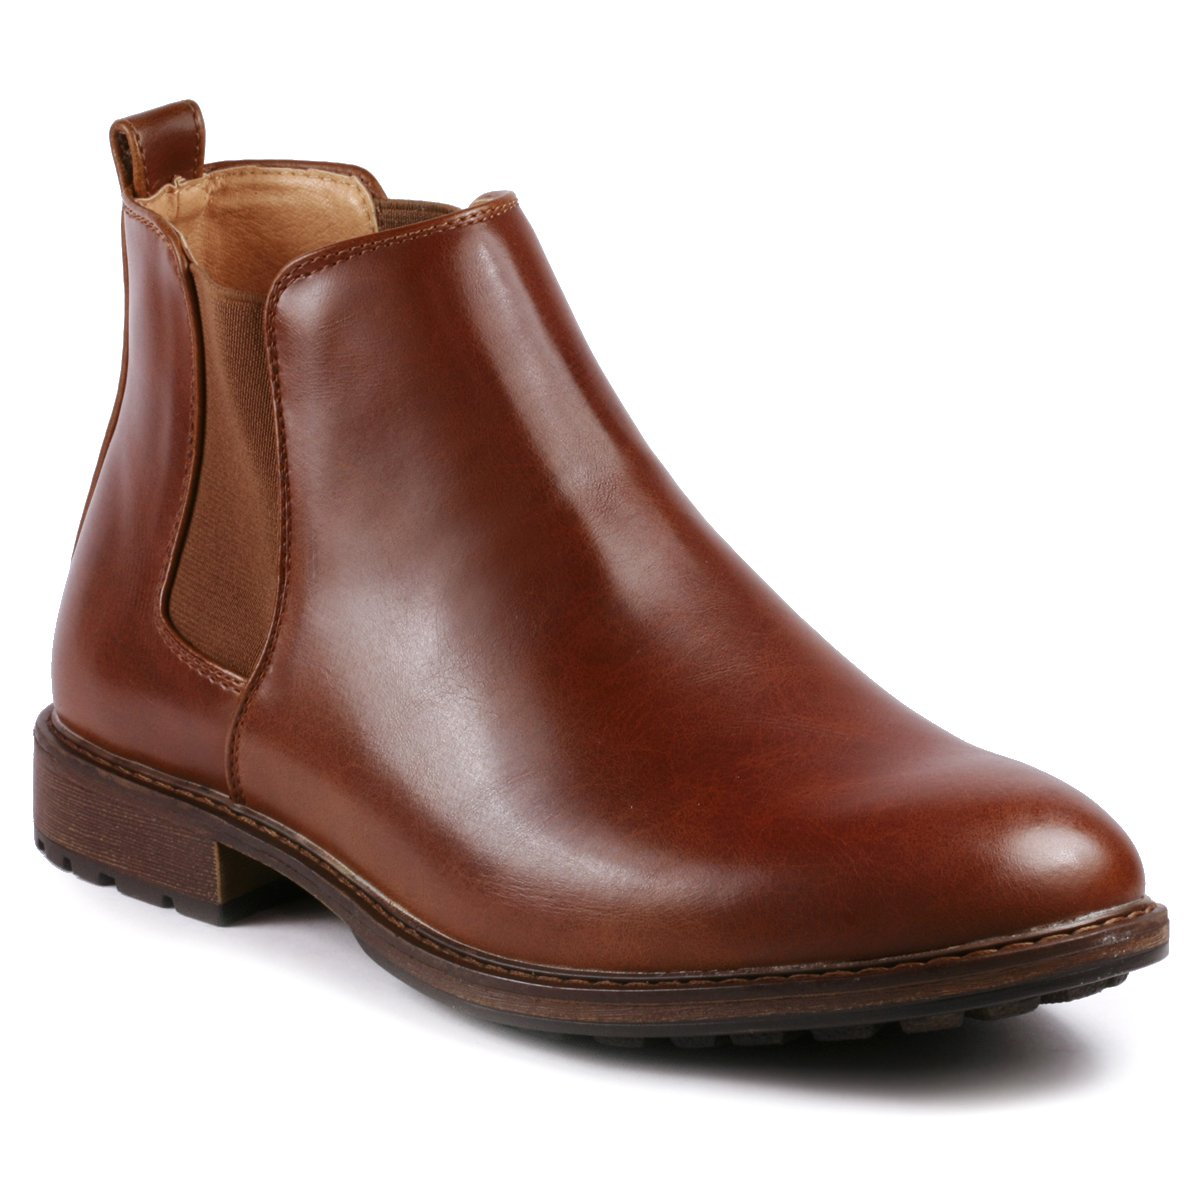 Metrocharm MC137 Men's Formal Dress Chelsea Ankle Boot (10 D(M) US, Brown)